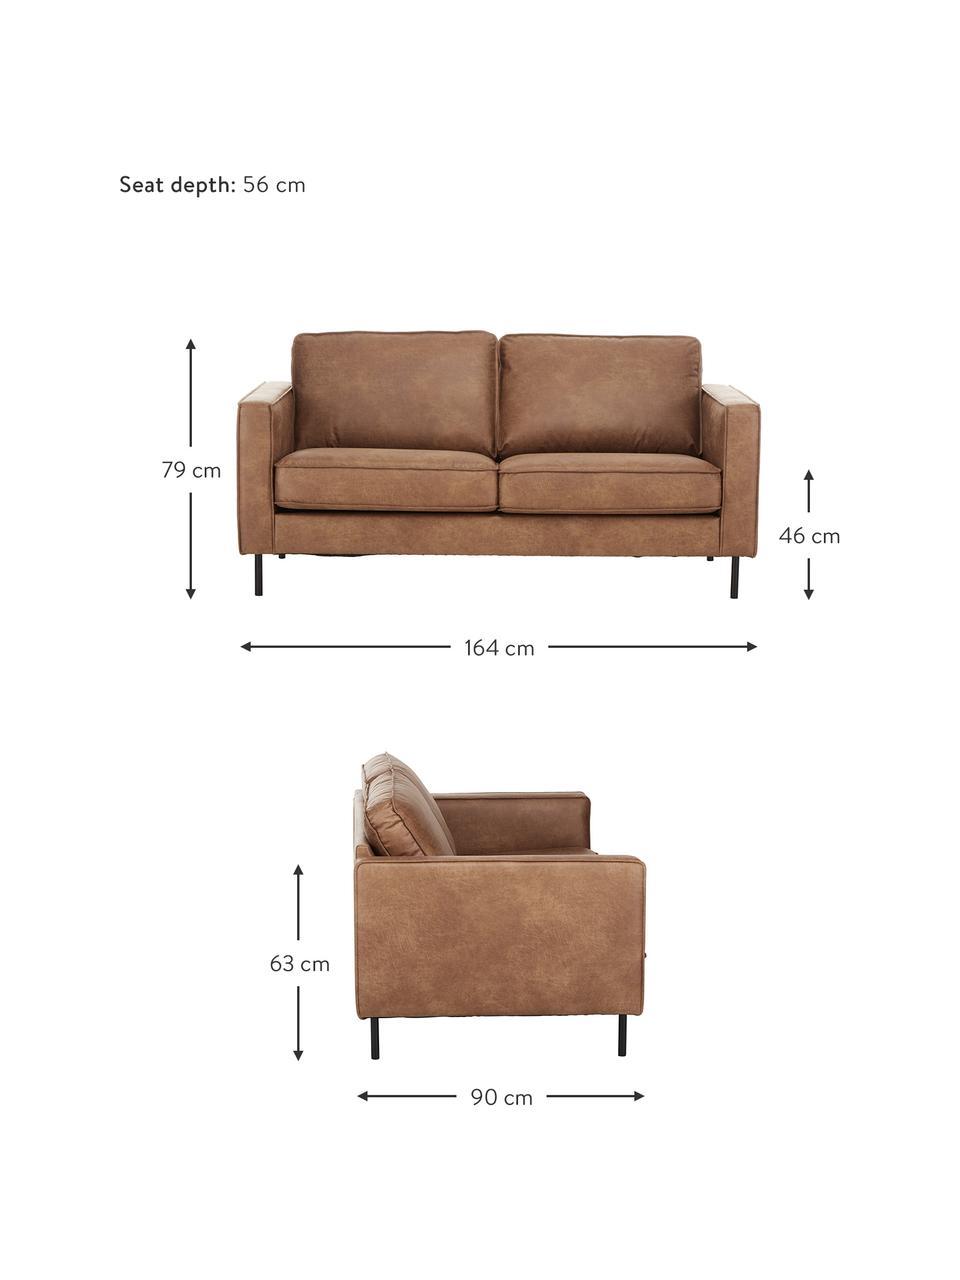 Sofa Hunter (2-Sitzer) in Braun aus recyceltem Leder, Bezug: Recyceltes Leder (70% Led, Gestell: Massives Birkenholz und h, Füße: Metall, pulverbeschichtet, Leder Braun, B 164 cm x T 90 cm